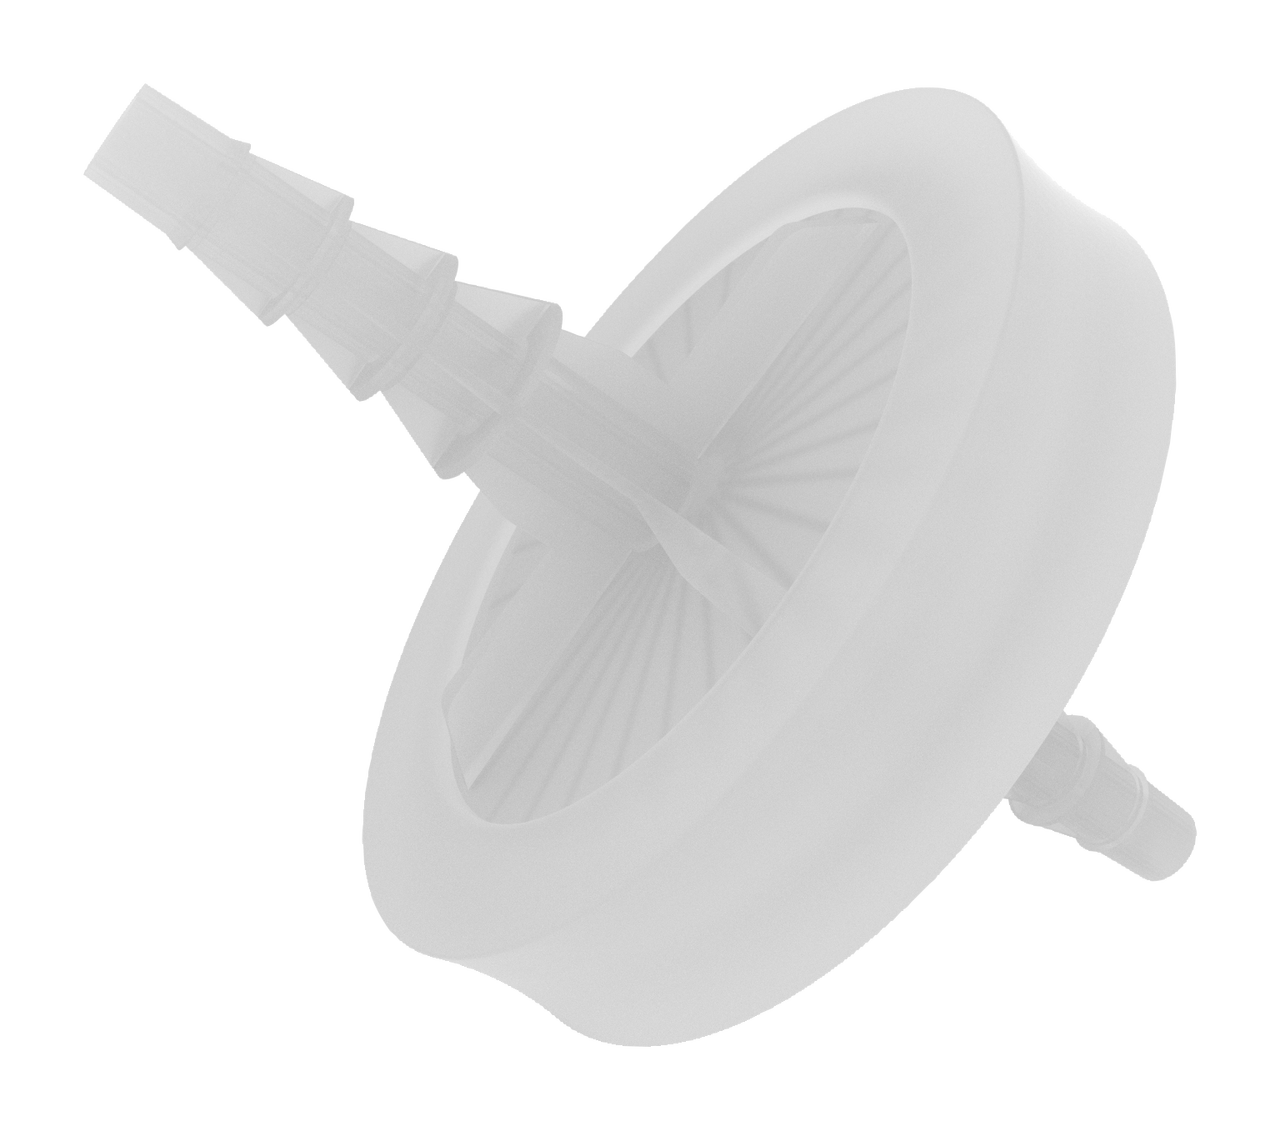 EZBio® Vent Filter, 0.22µm Non-Sterile, 40mm, Autoclave Only, 100/cs